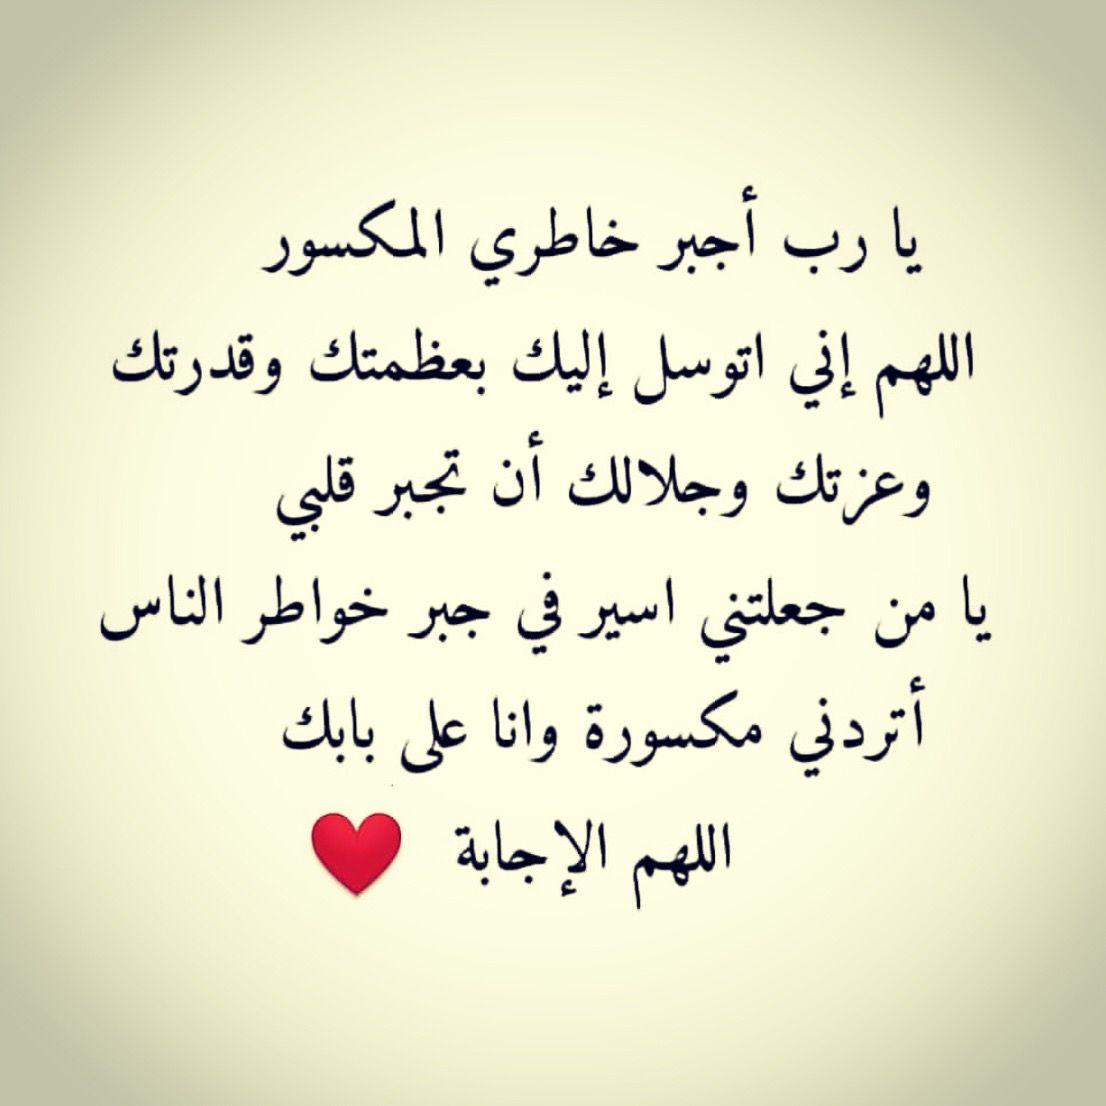 Pin By Hanan Aladwani On دعاء من القلب Calligraphy Arabic Calligraphy